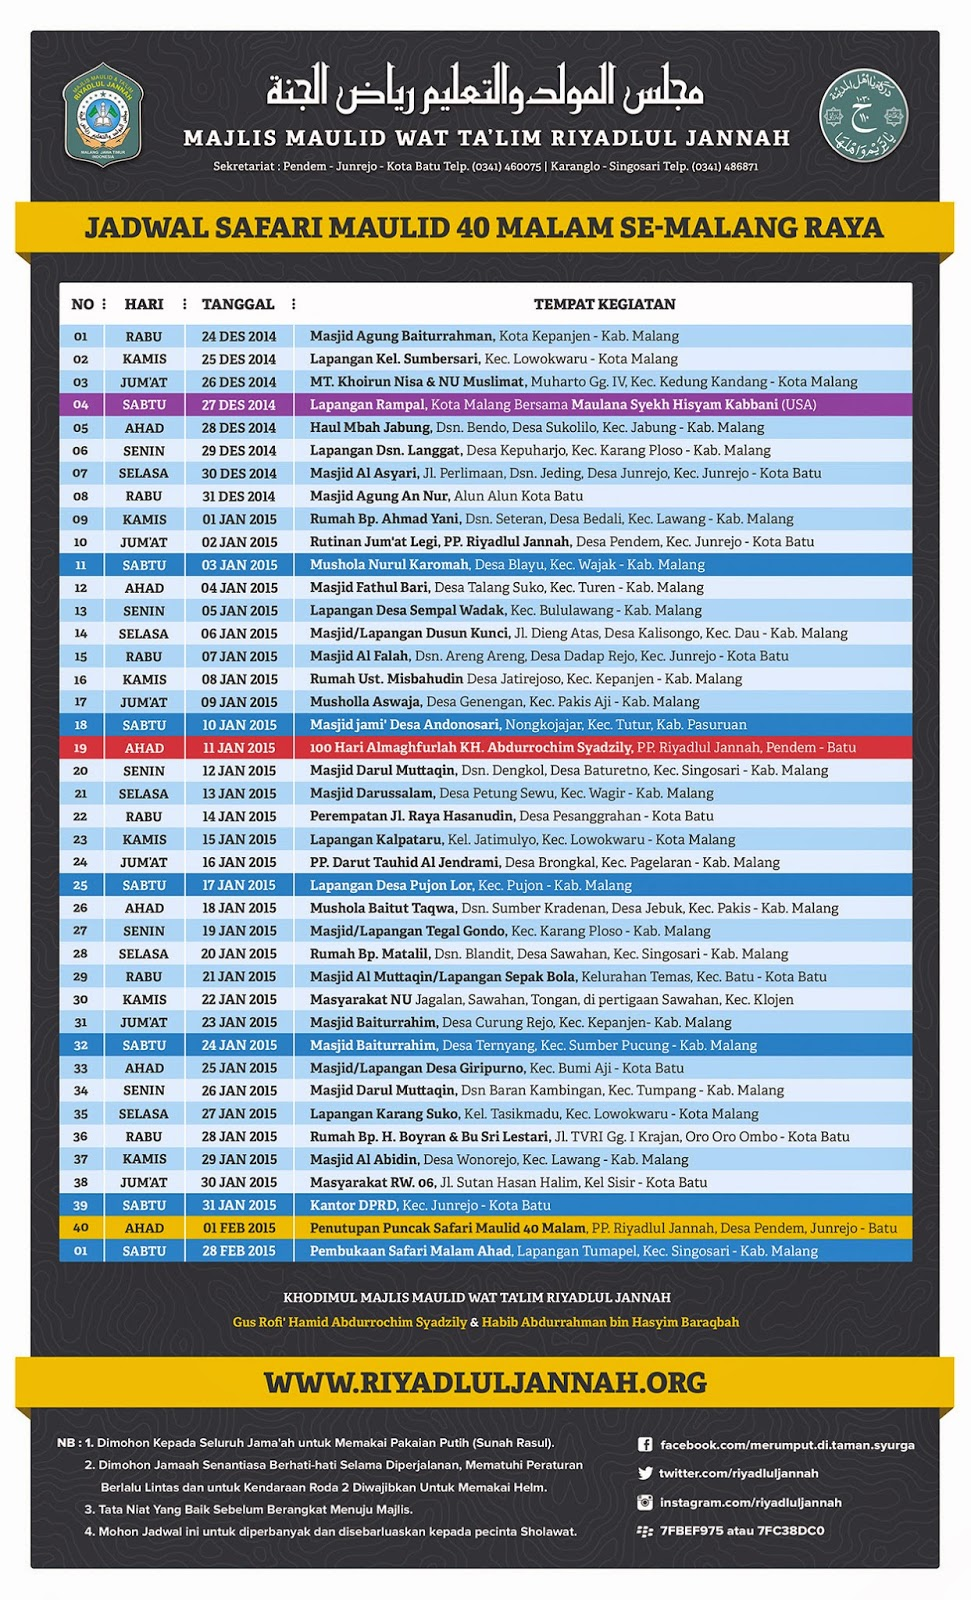 Jadwal Safari Maulid 40 Malam Majelis Riyadlul Jannah Malang 2014-2015